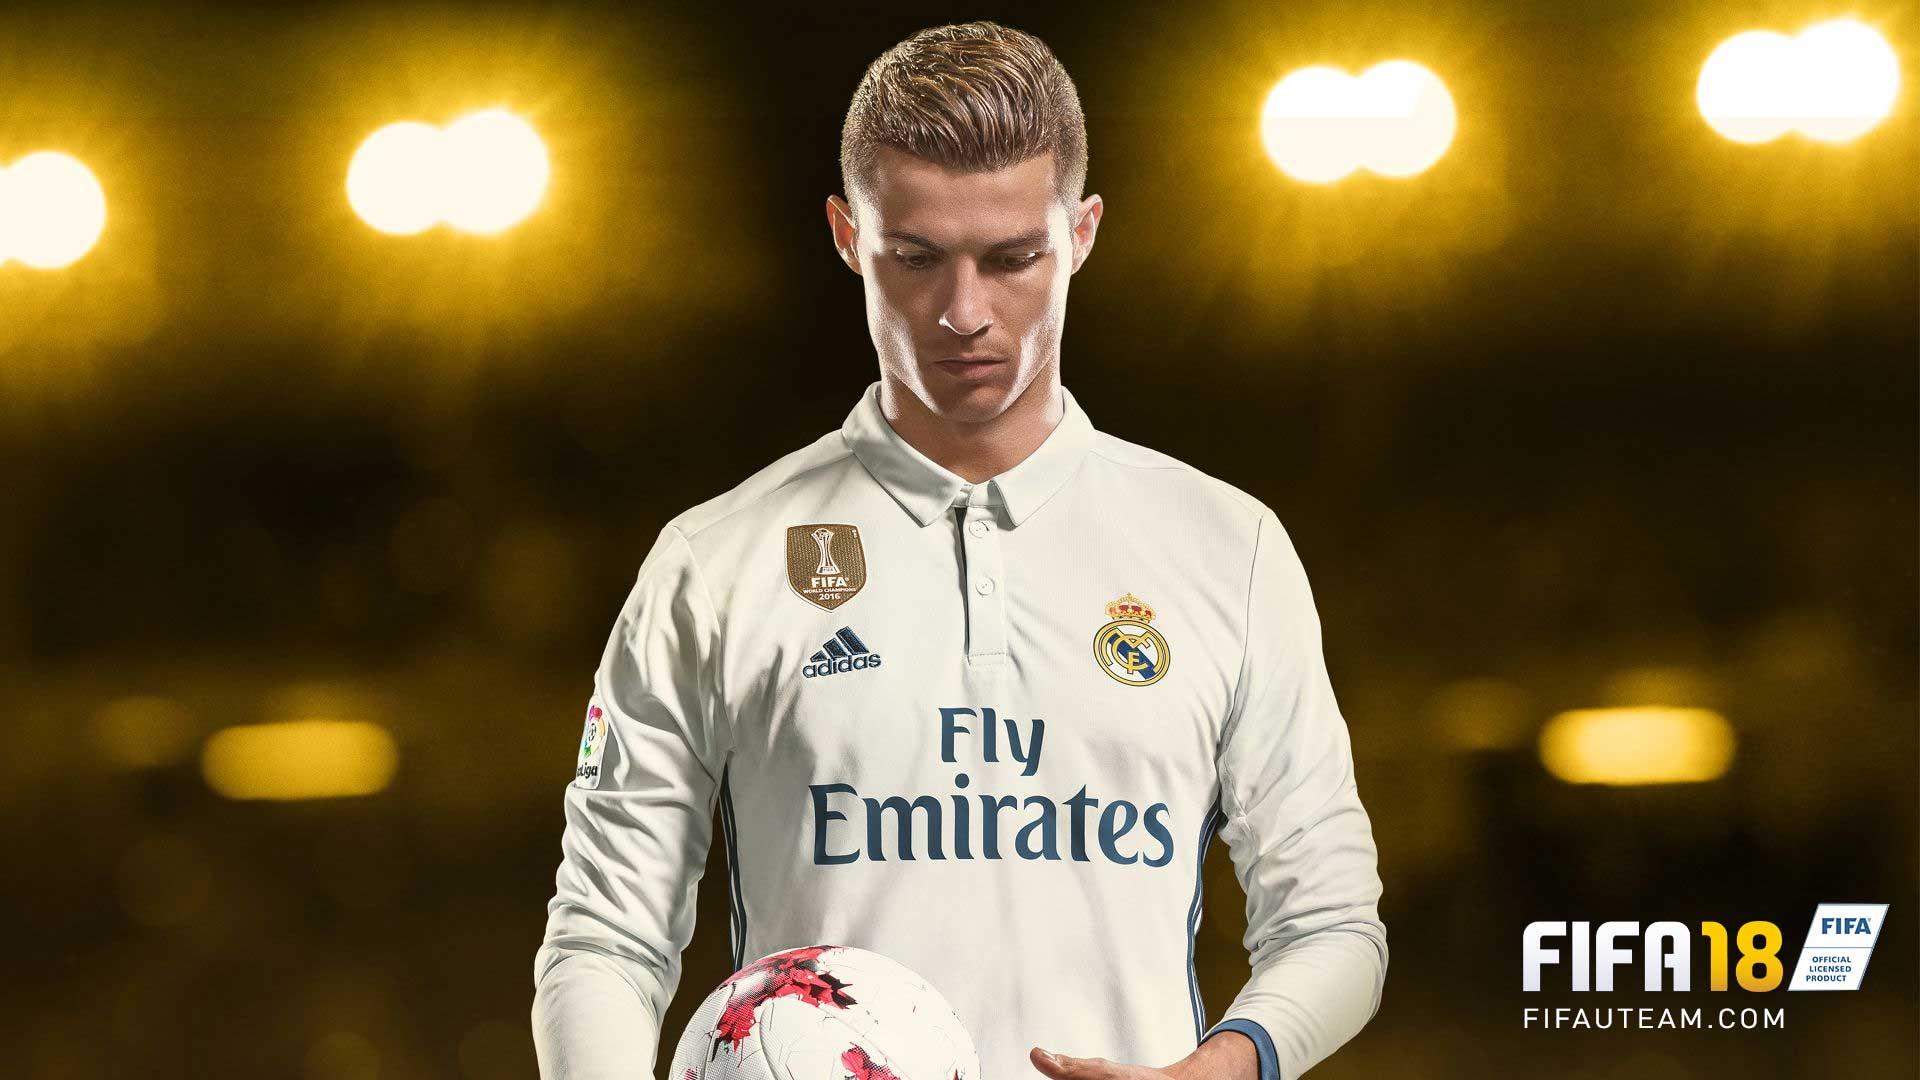 FIFA 2018 Cristiano Ronaldo Wallpaper 2018 Wallpapers HD